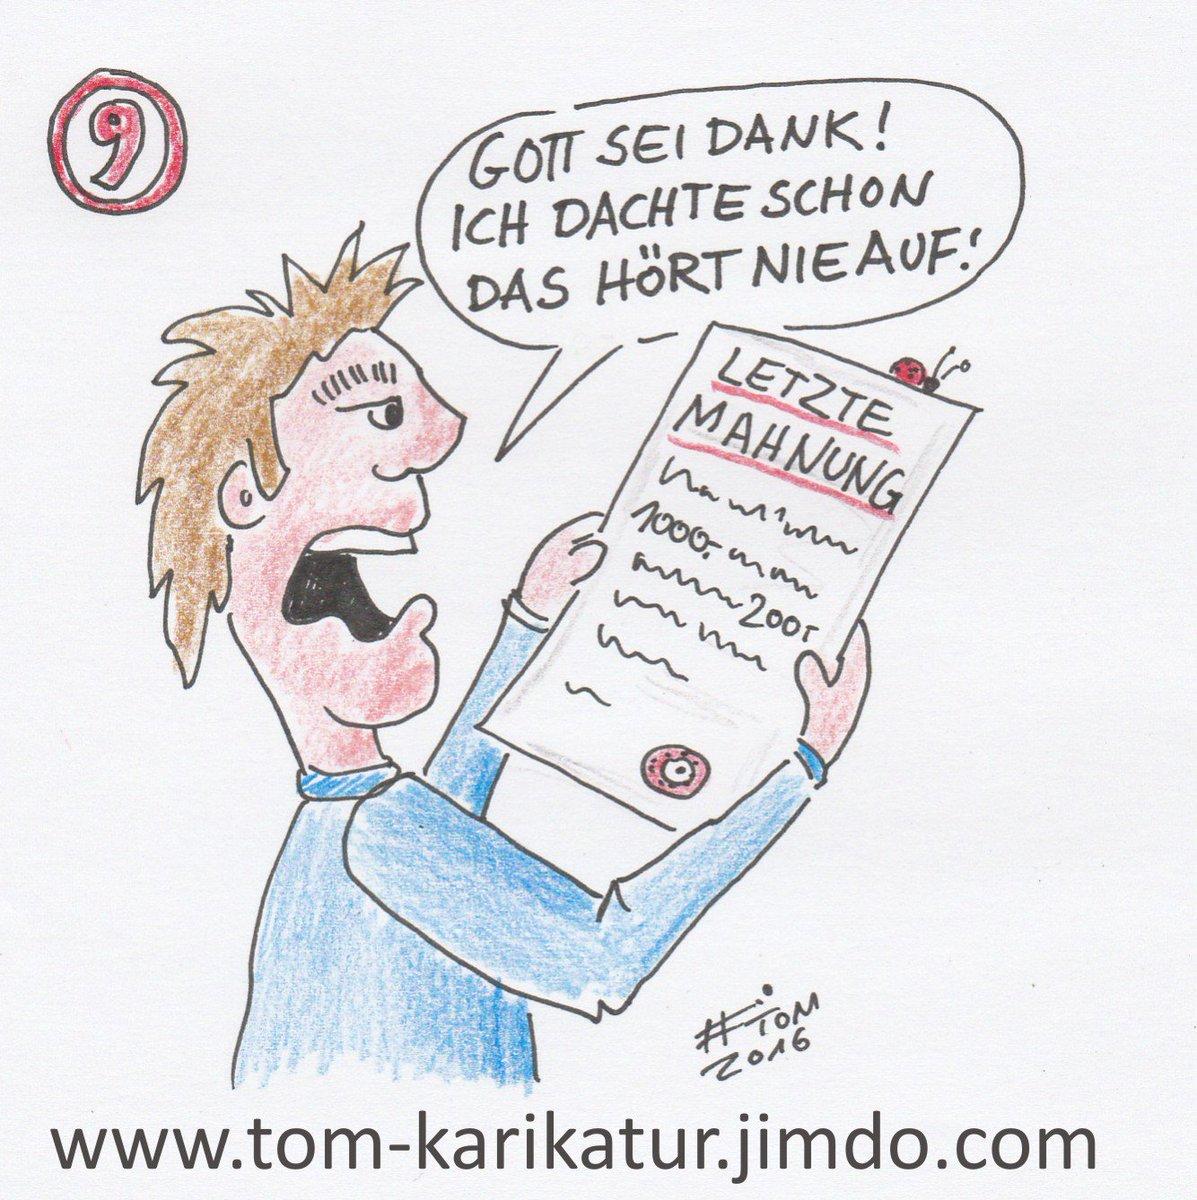 Tom Karikatur At Tomkarikatur Twitter